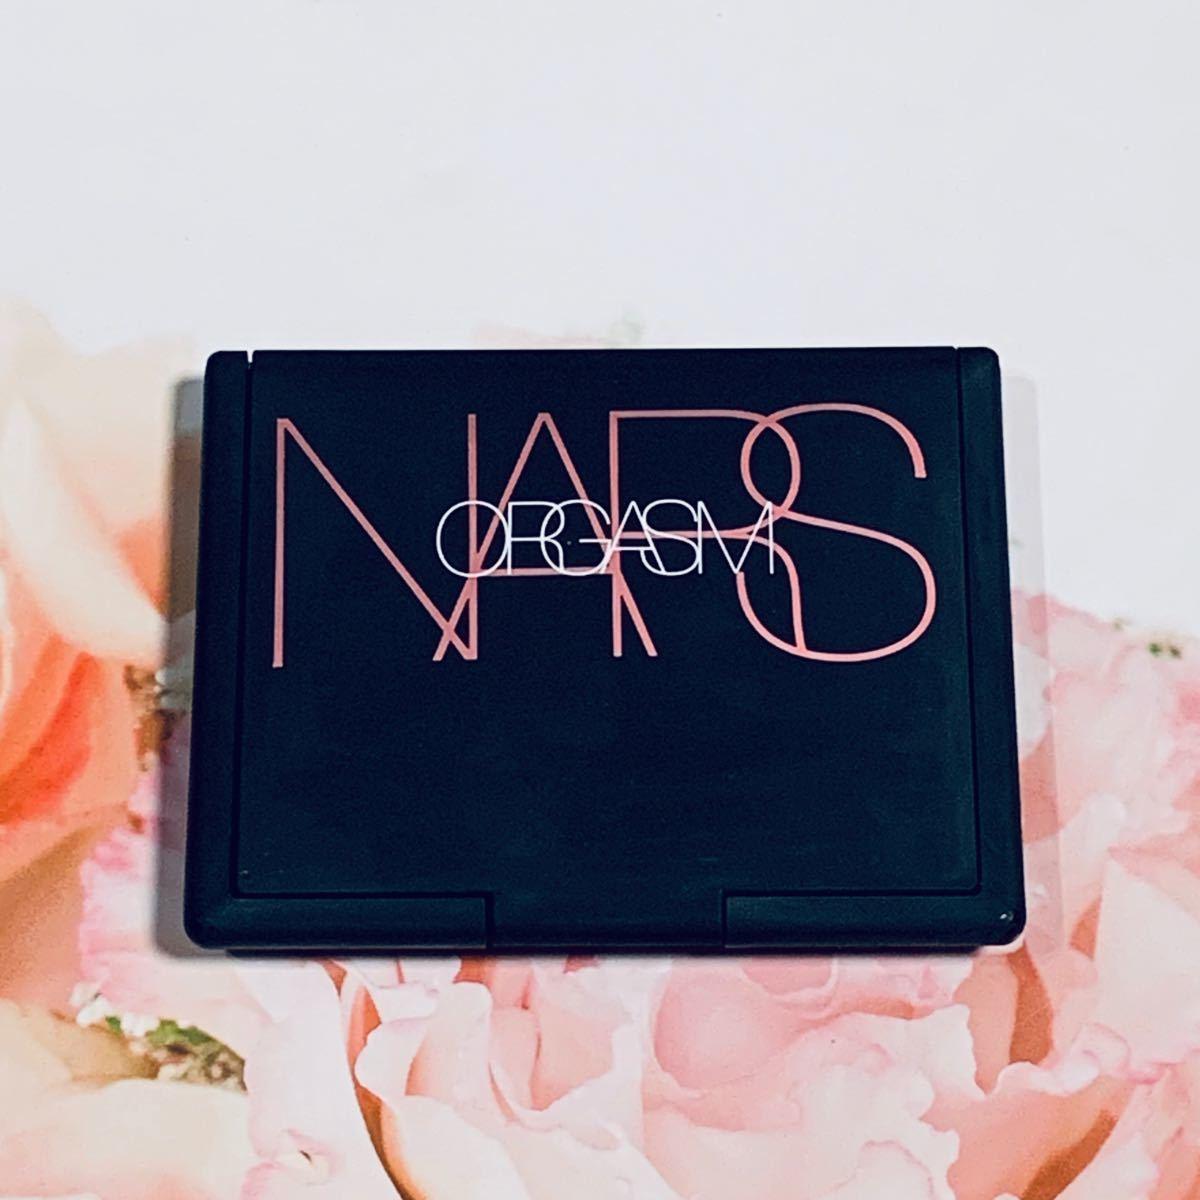 NARS オーガズム 5194 ビッグサイズ